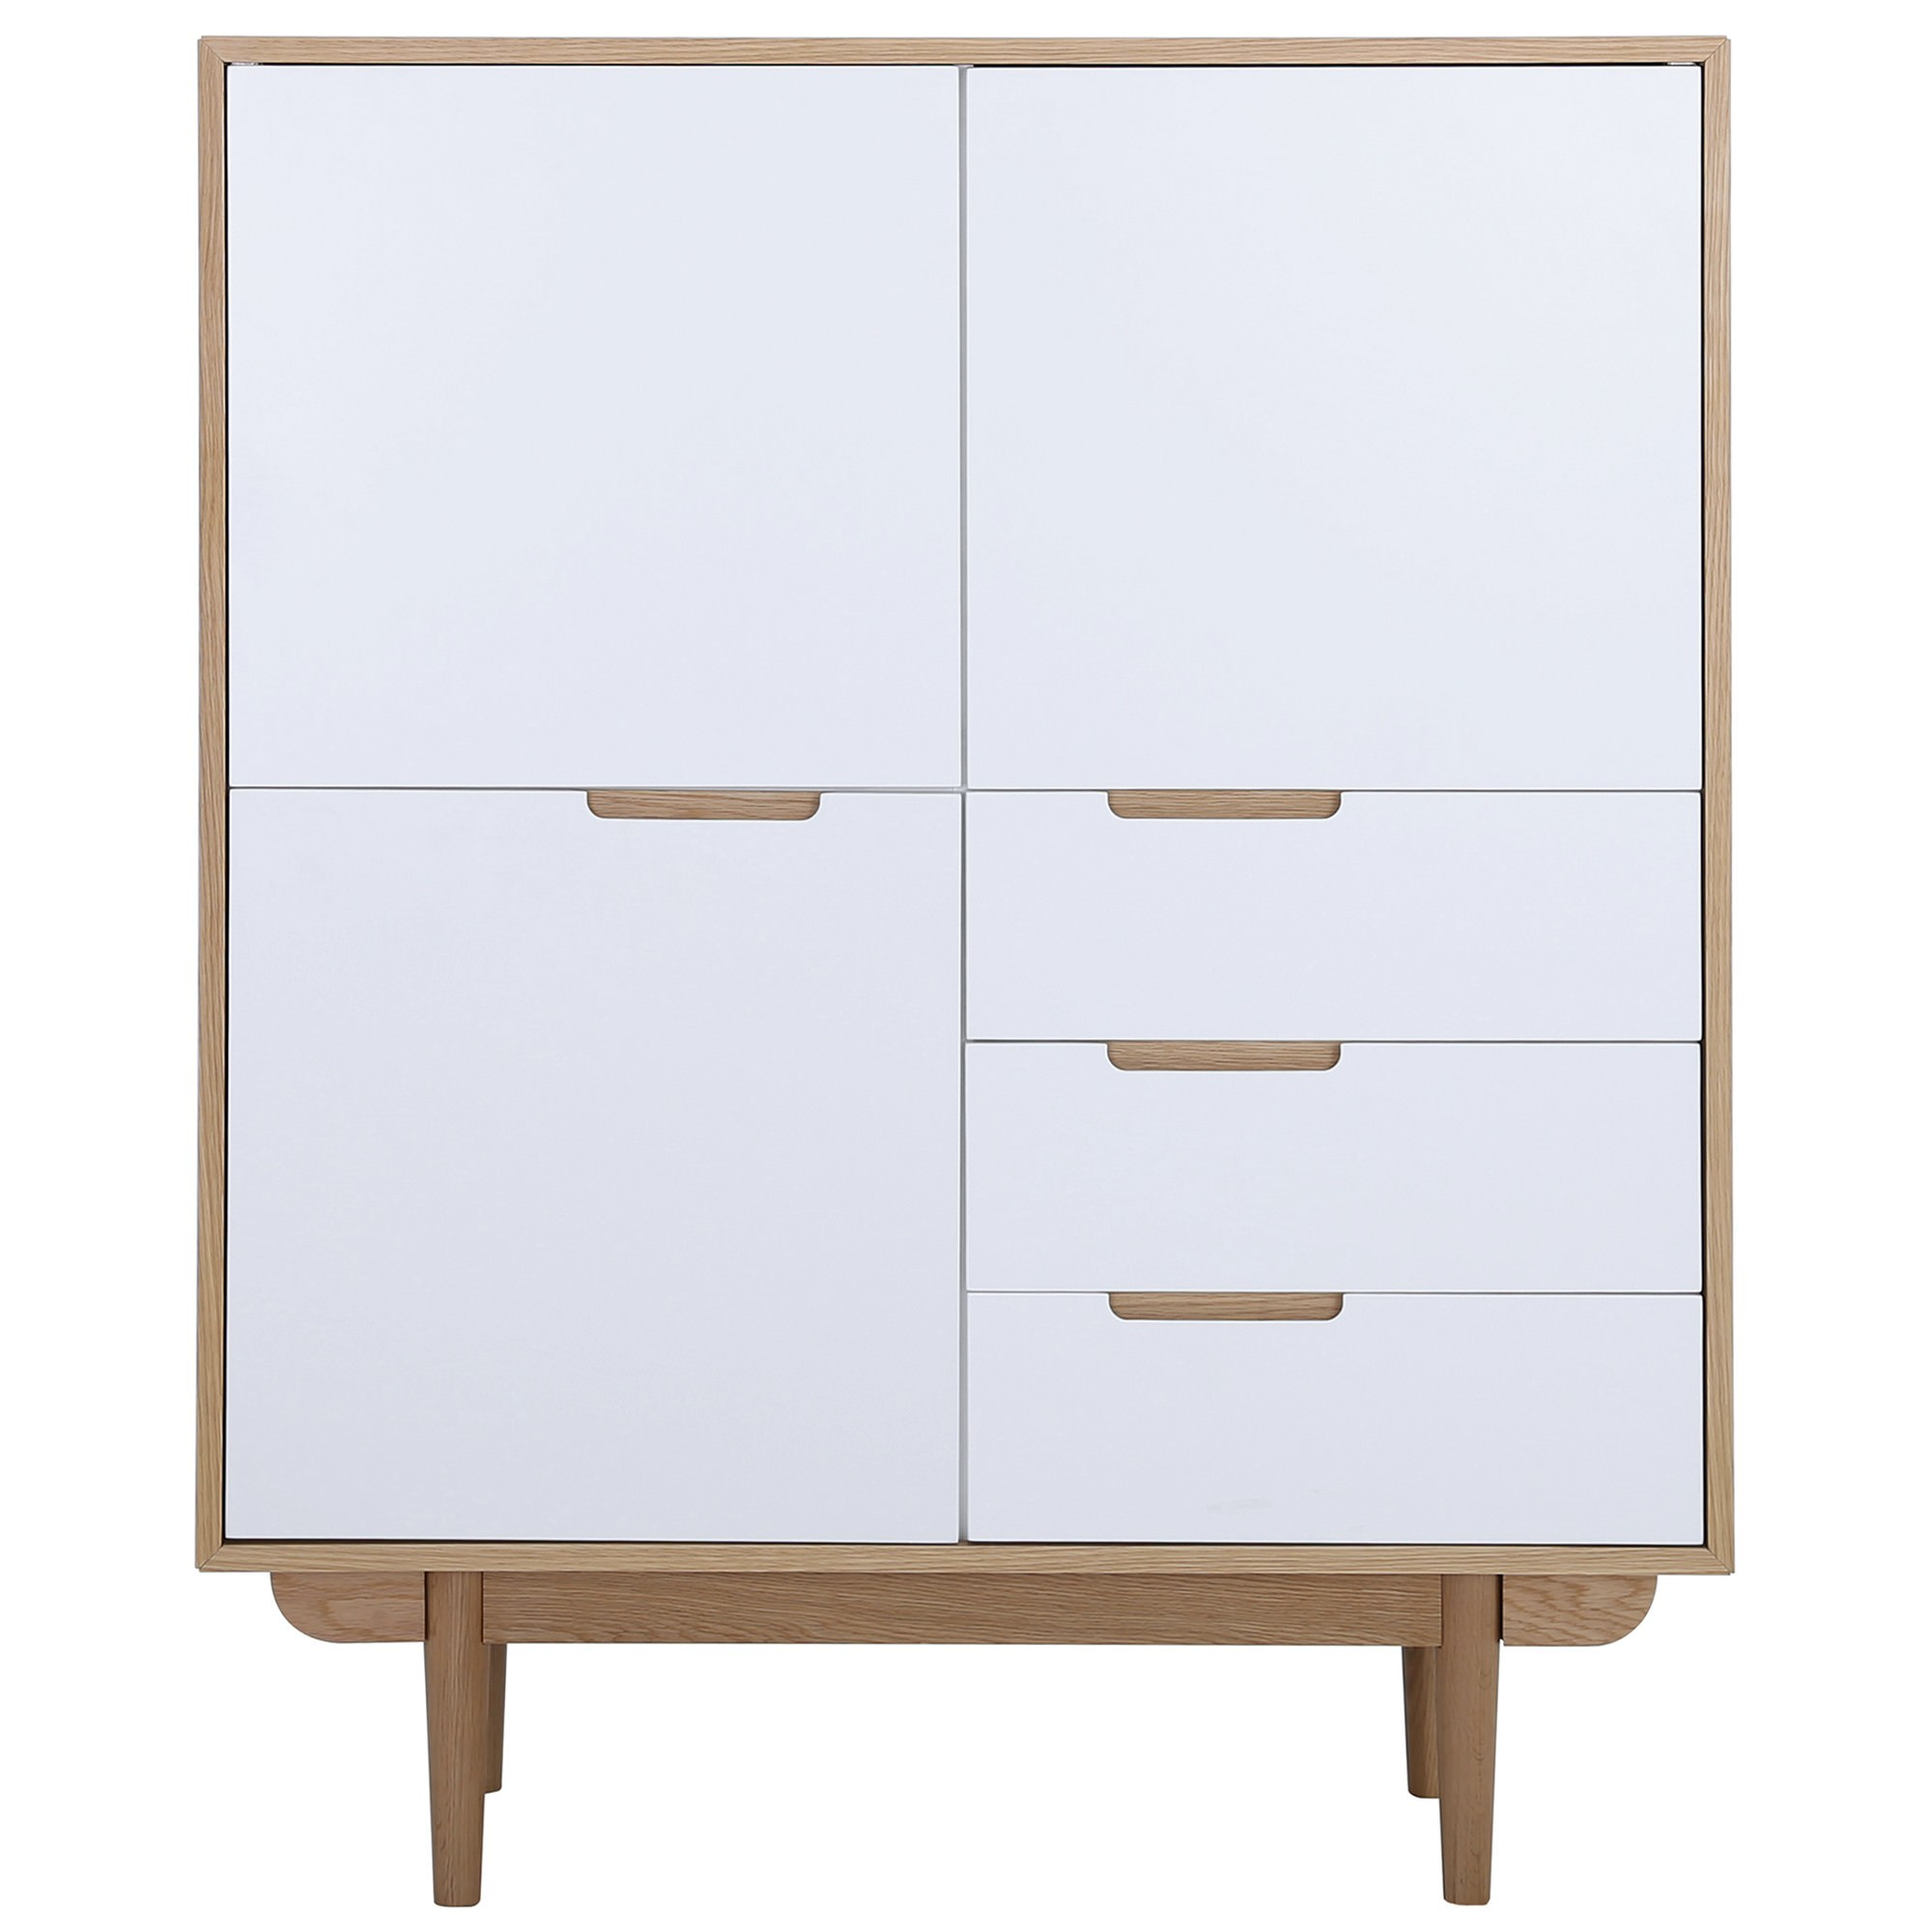 Nakula 2 Door 3 Drawer Cupboard, Natural / White